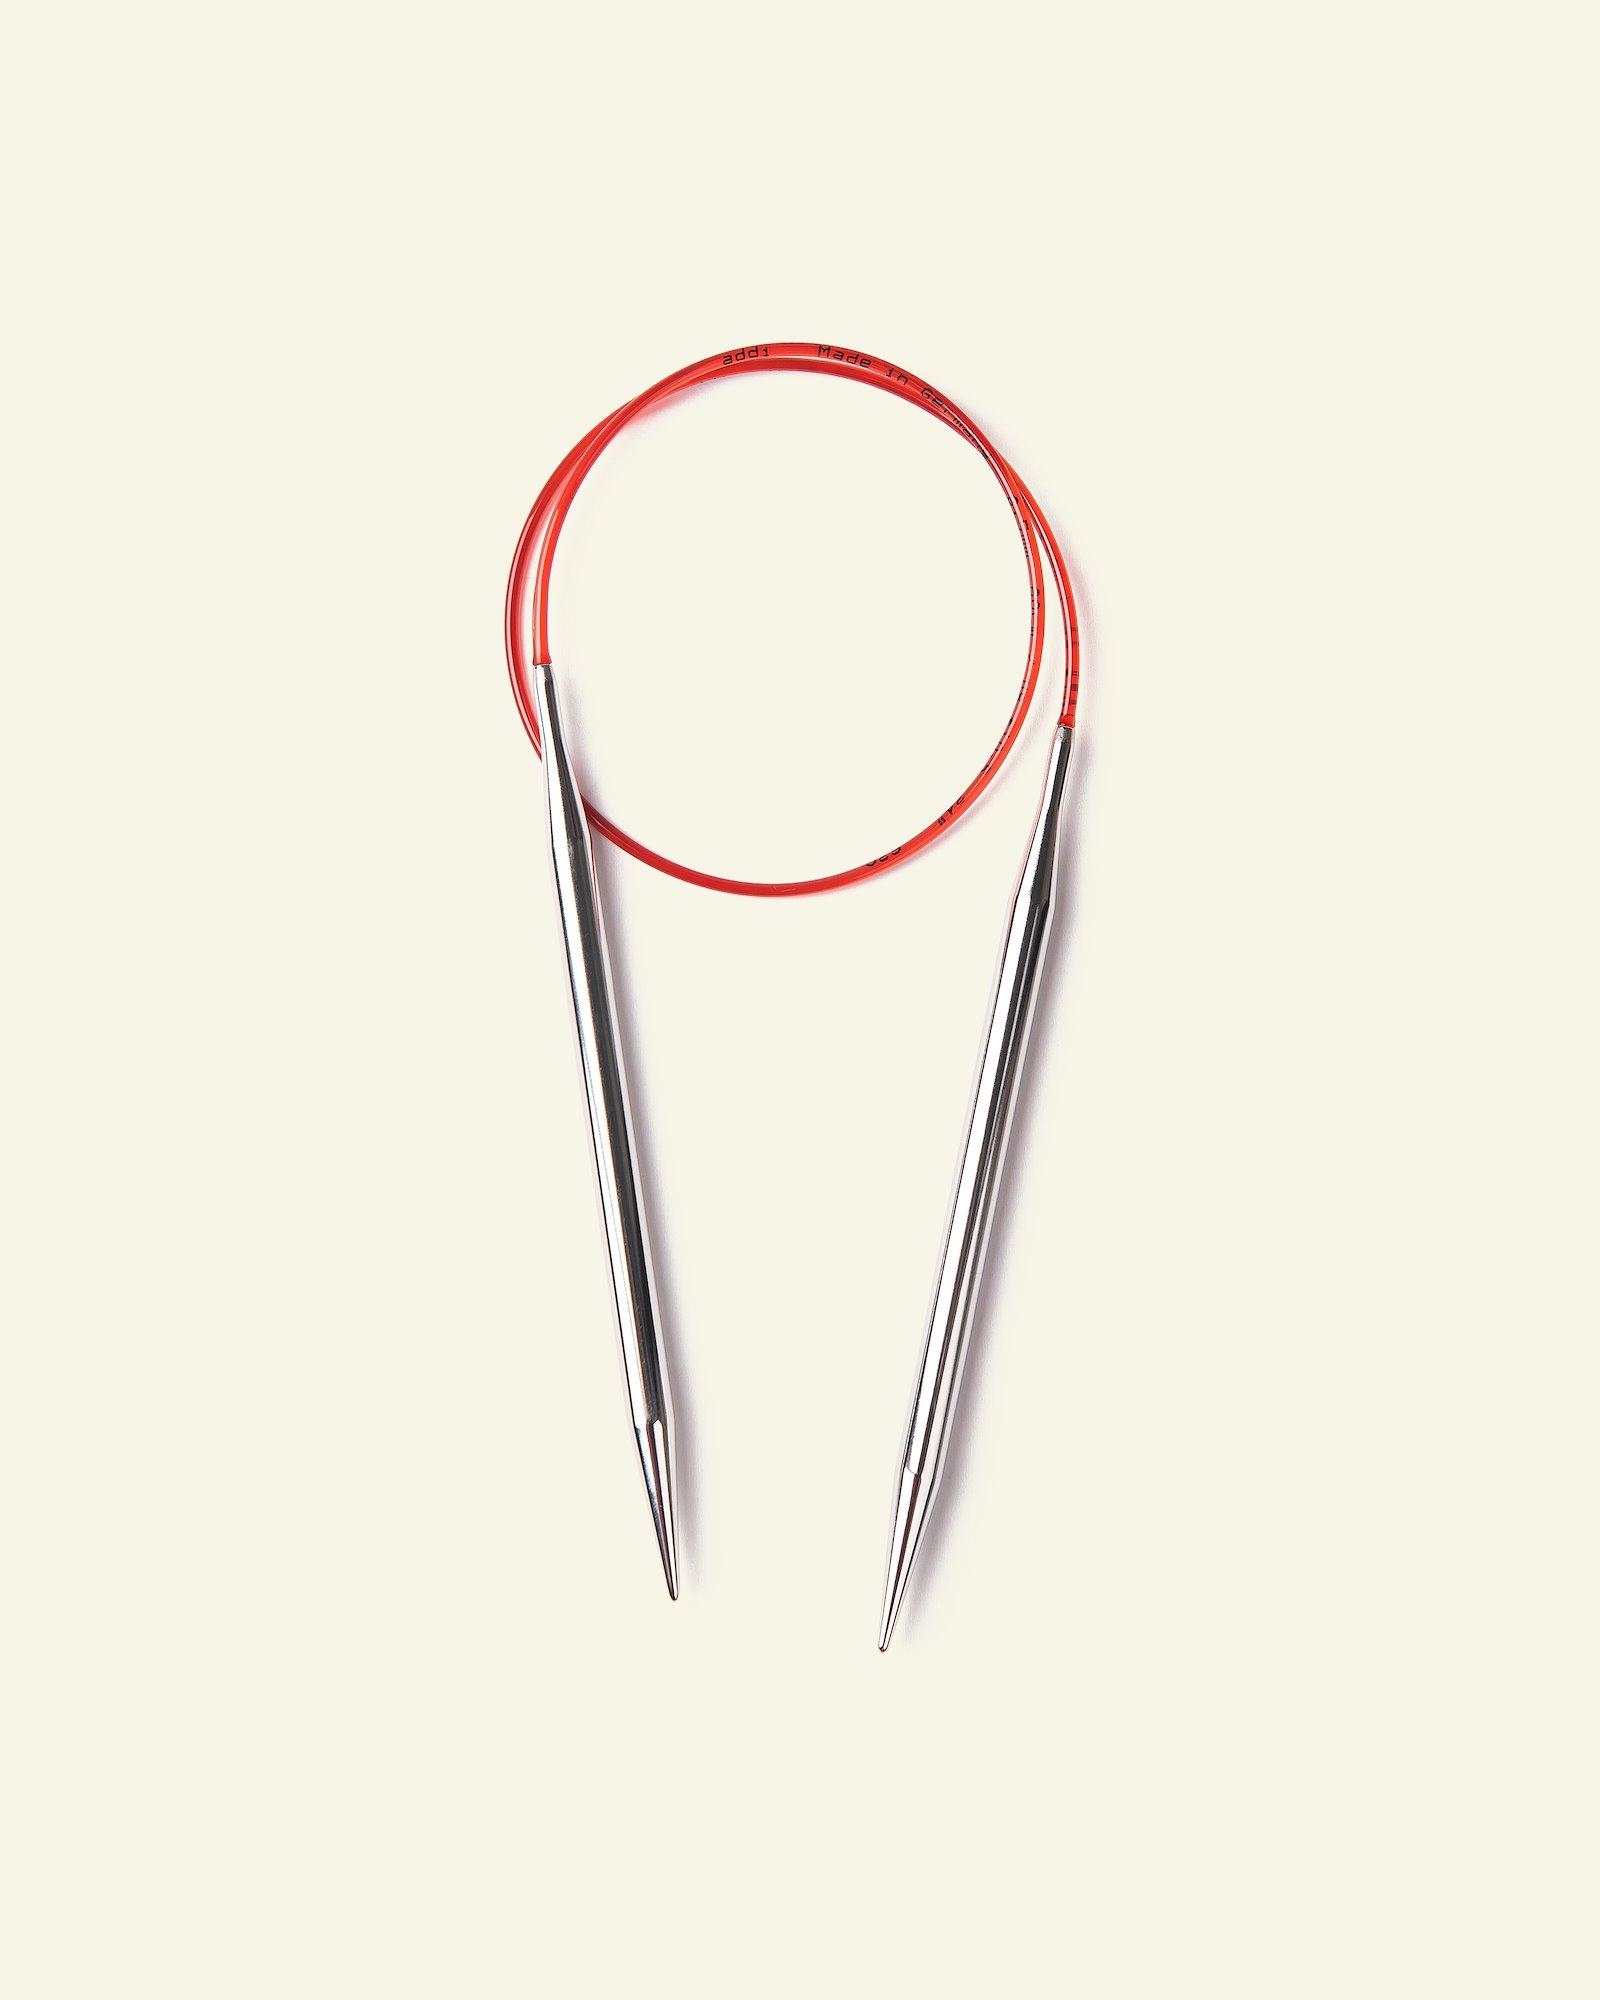 Addi Lace circular needle 60cm 6,5mm